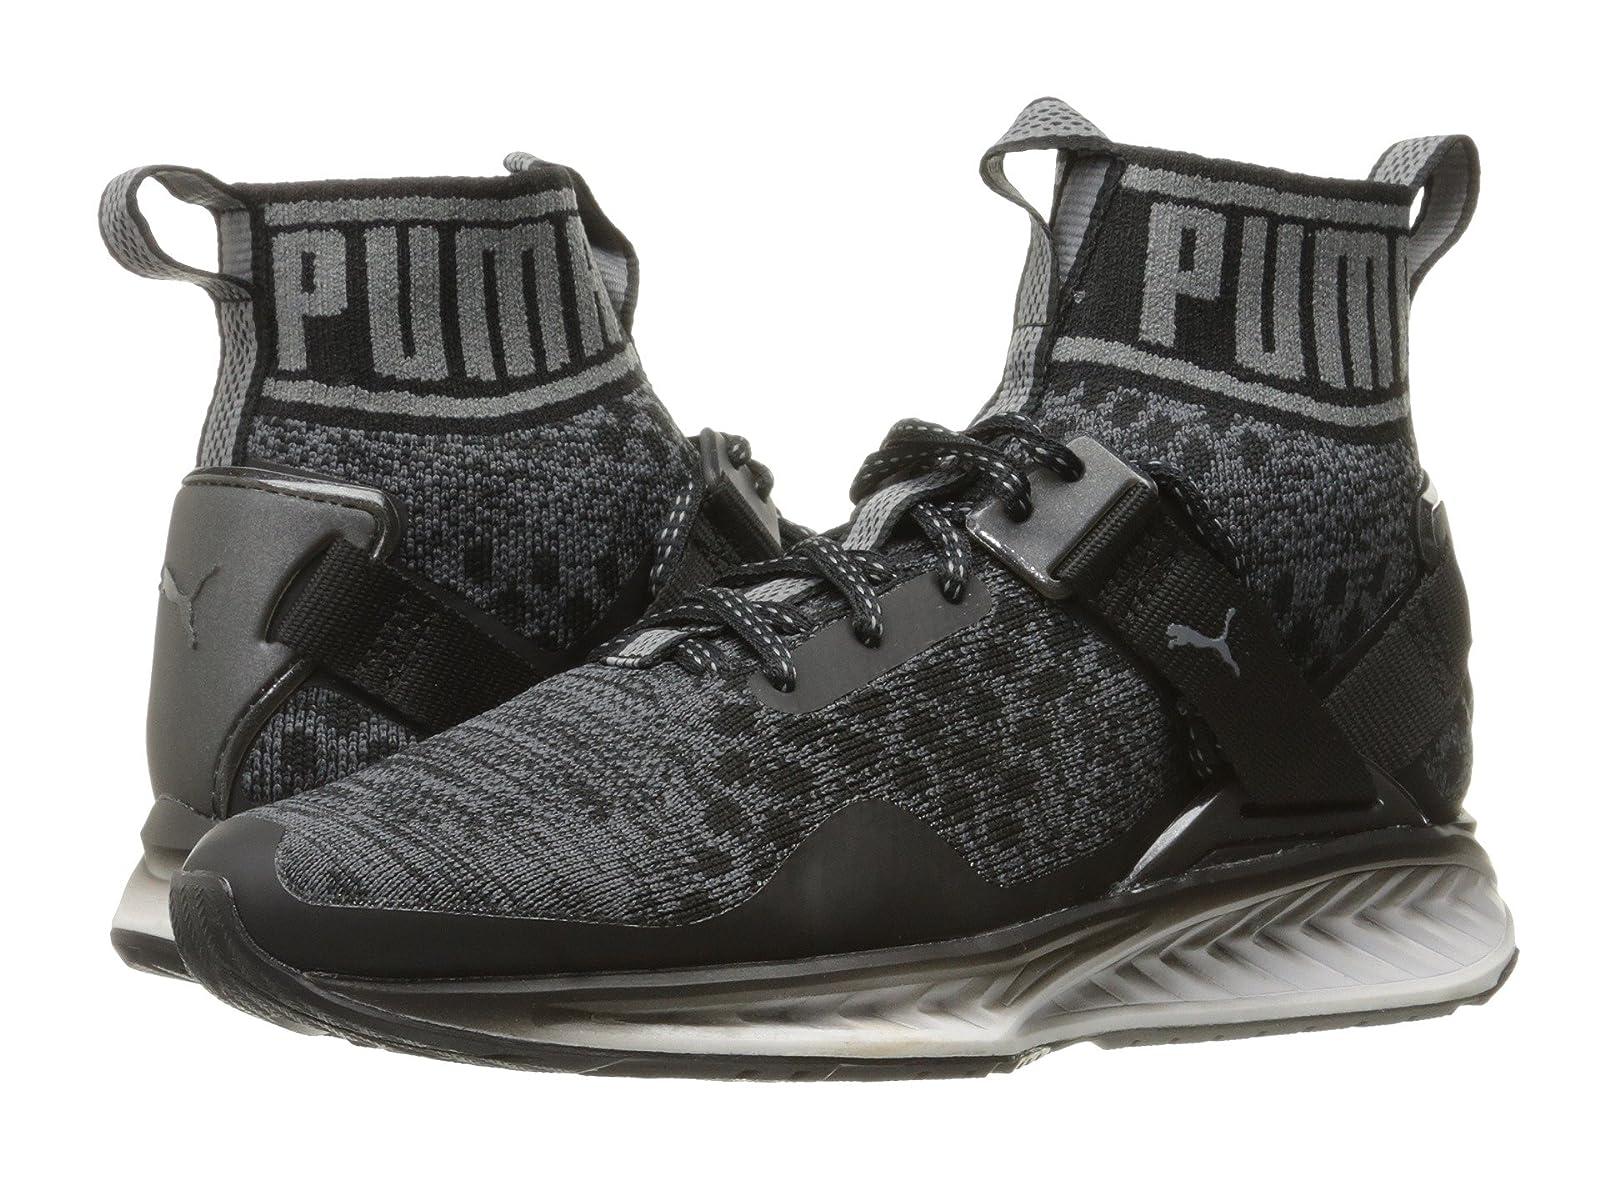 PUMA Ignite evoKNIT FadeCheap and distinctive eye-catching shoes